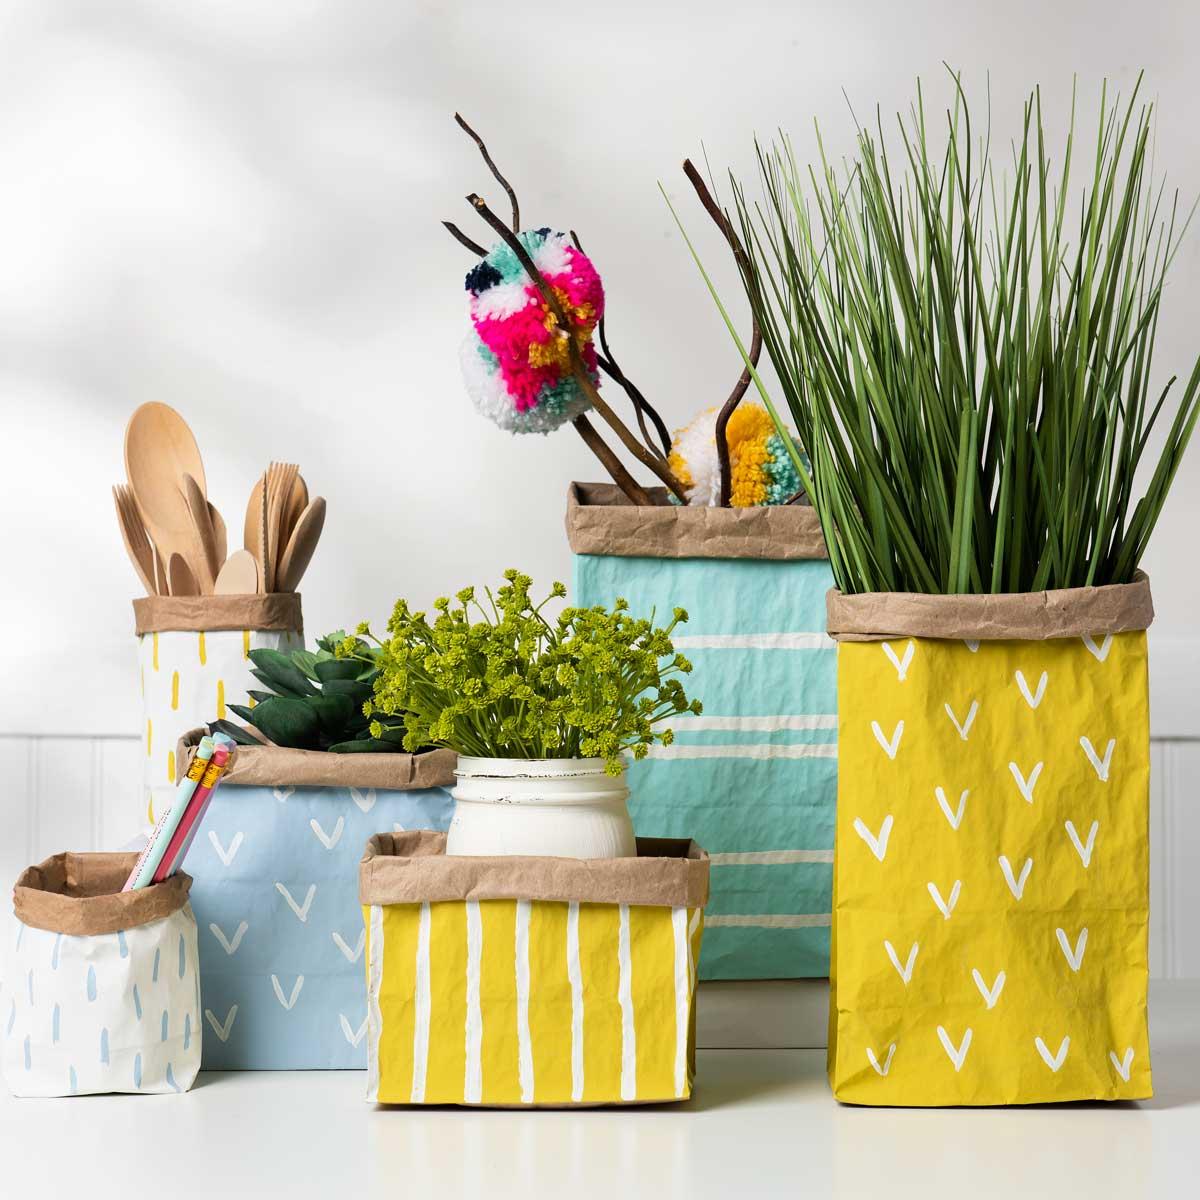 Painted Paper Bag Planters